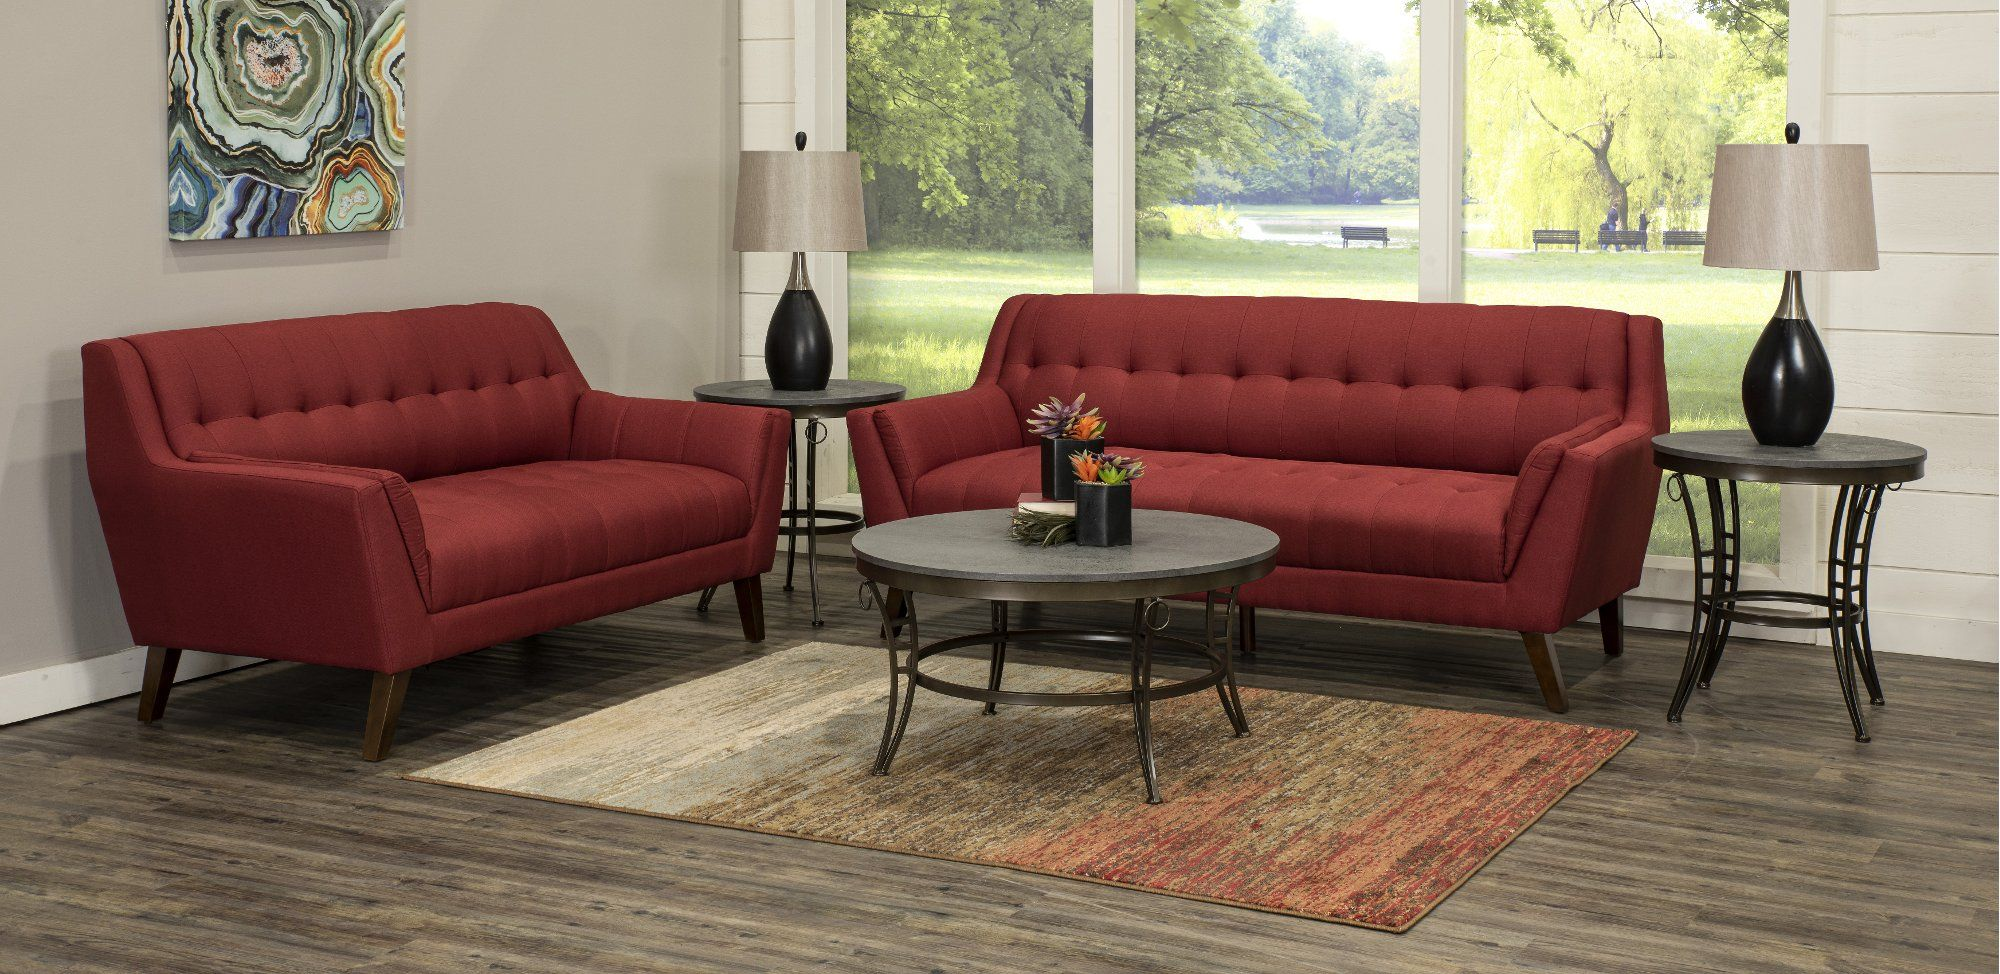 Mid Century Modern Red 5 Piece Living Room Set Celeste 5 Piece